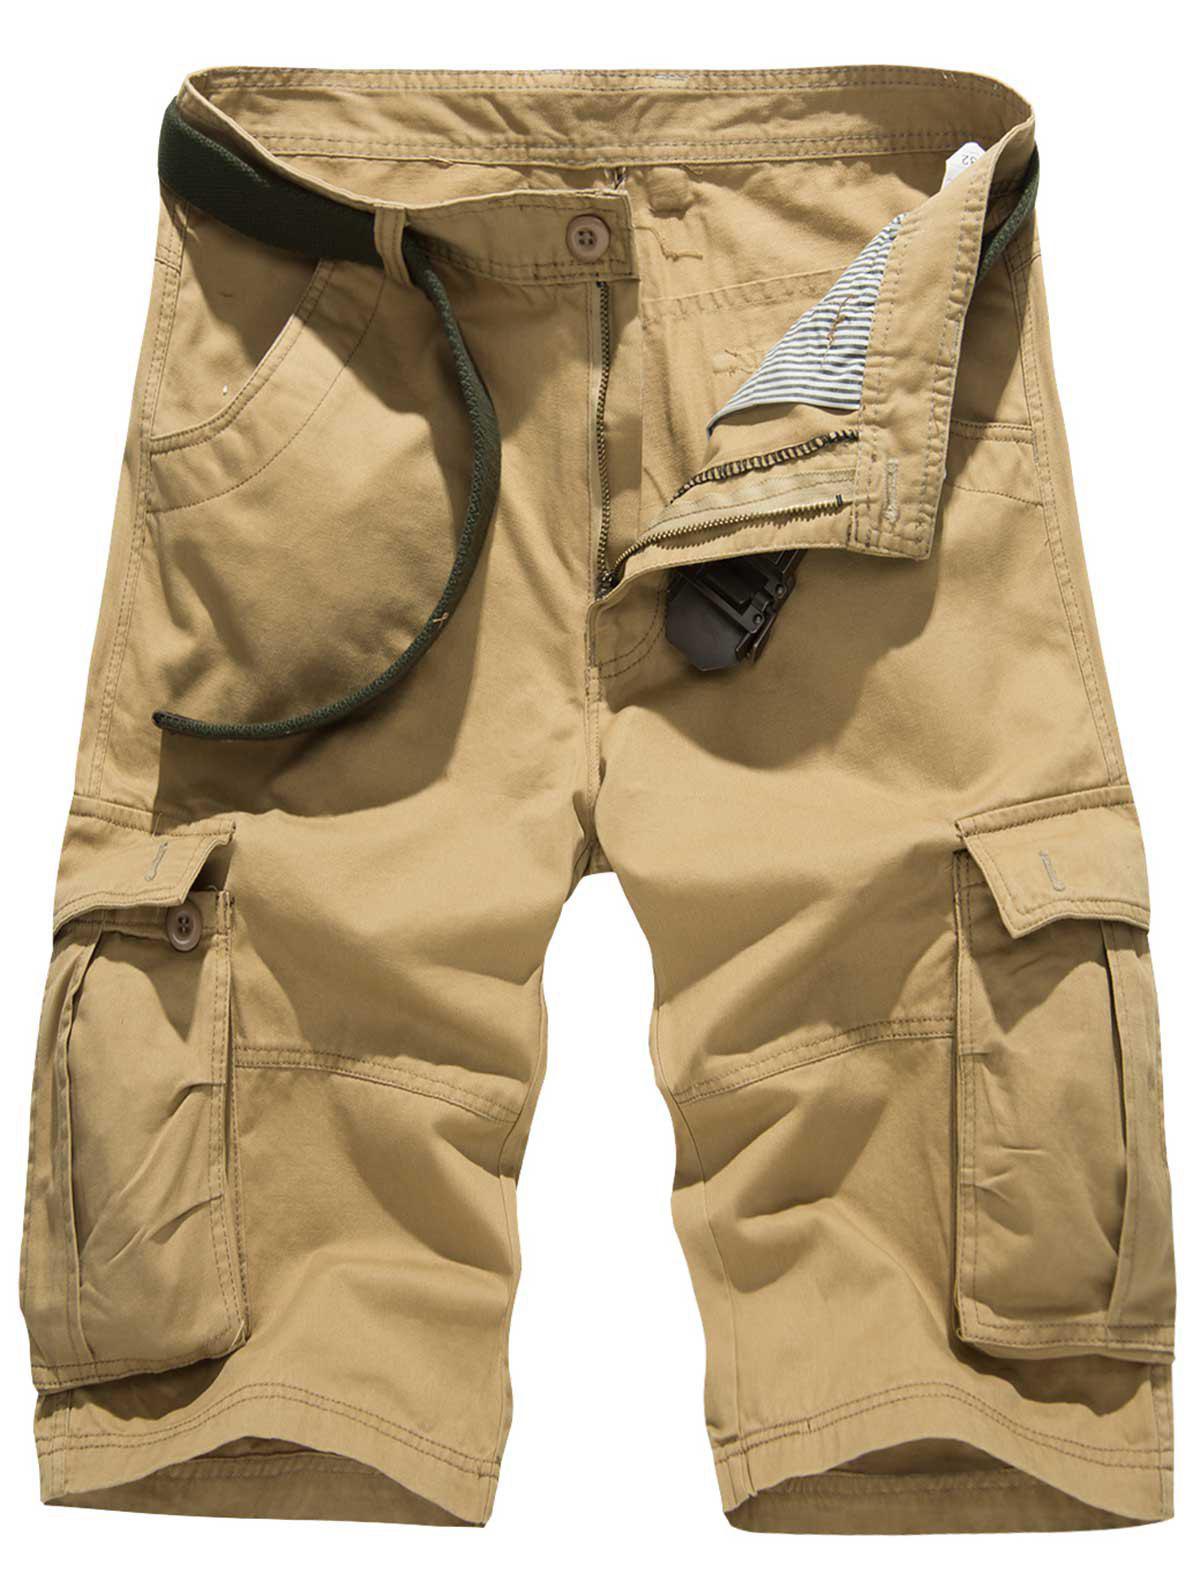 Zipper Fly Pockets Embellished Design Cargo Shorts 215866026